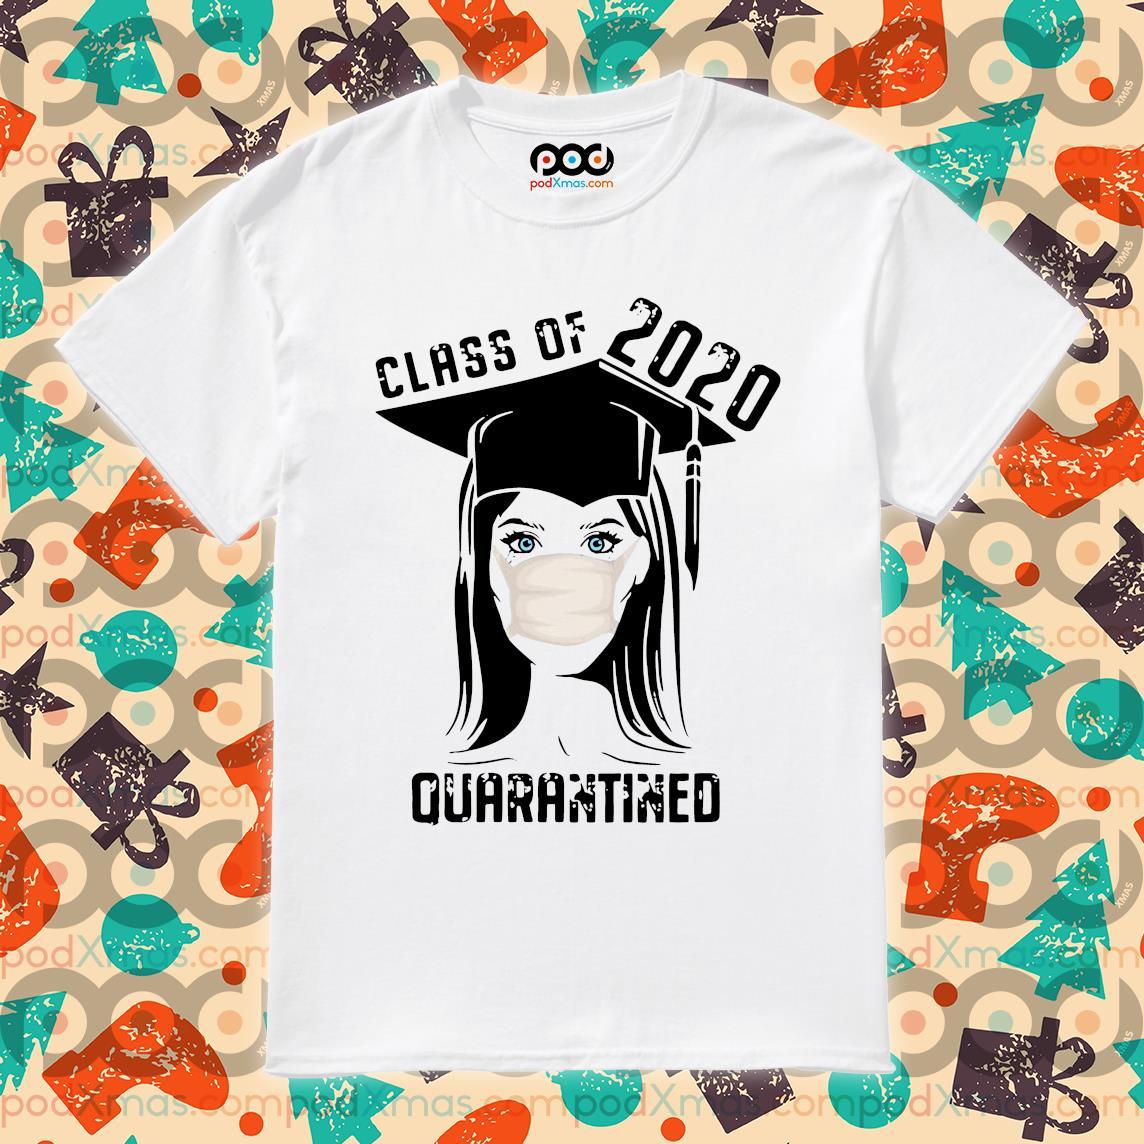 Class of 2020 Quarantined girl T-shirt